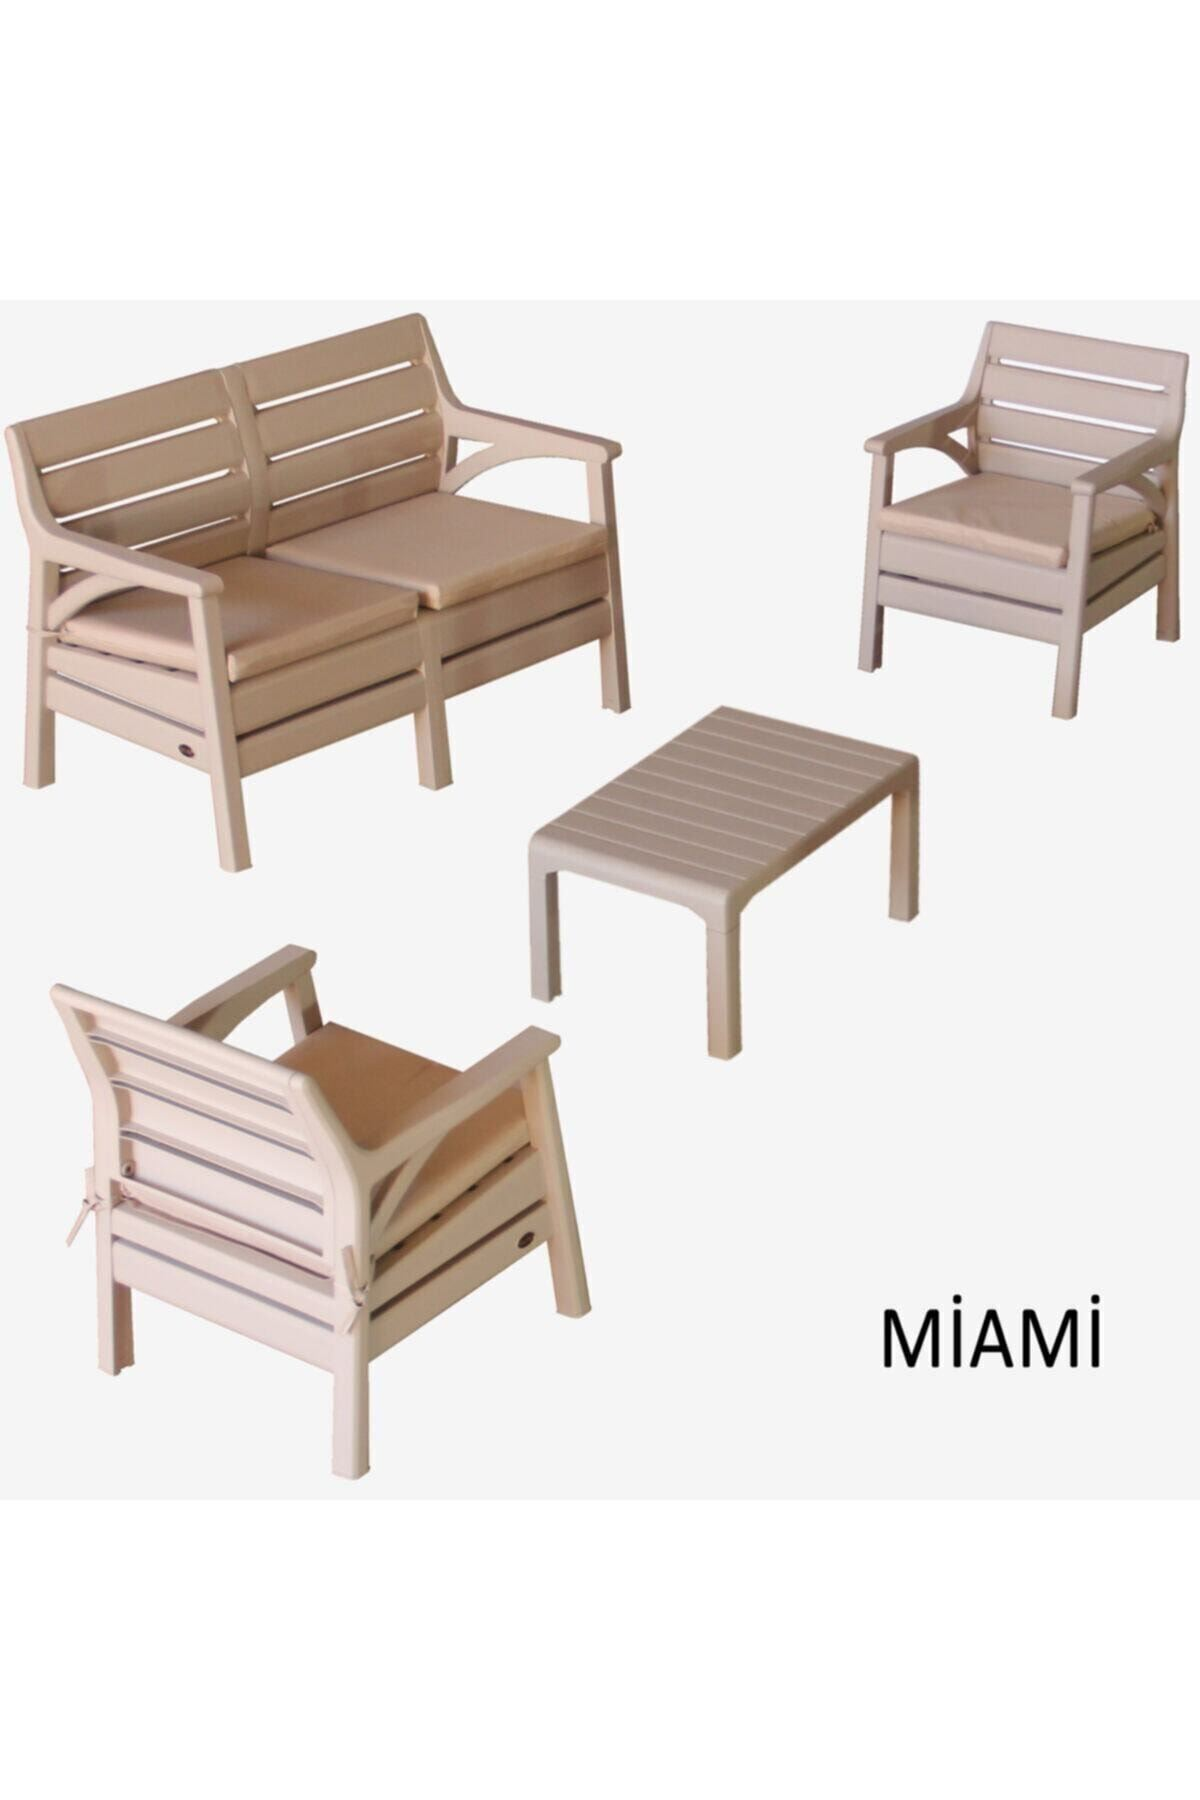 Miami Bahçe Ve Balkon Seti Oturma Grubu Cappucino